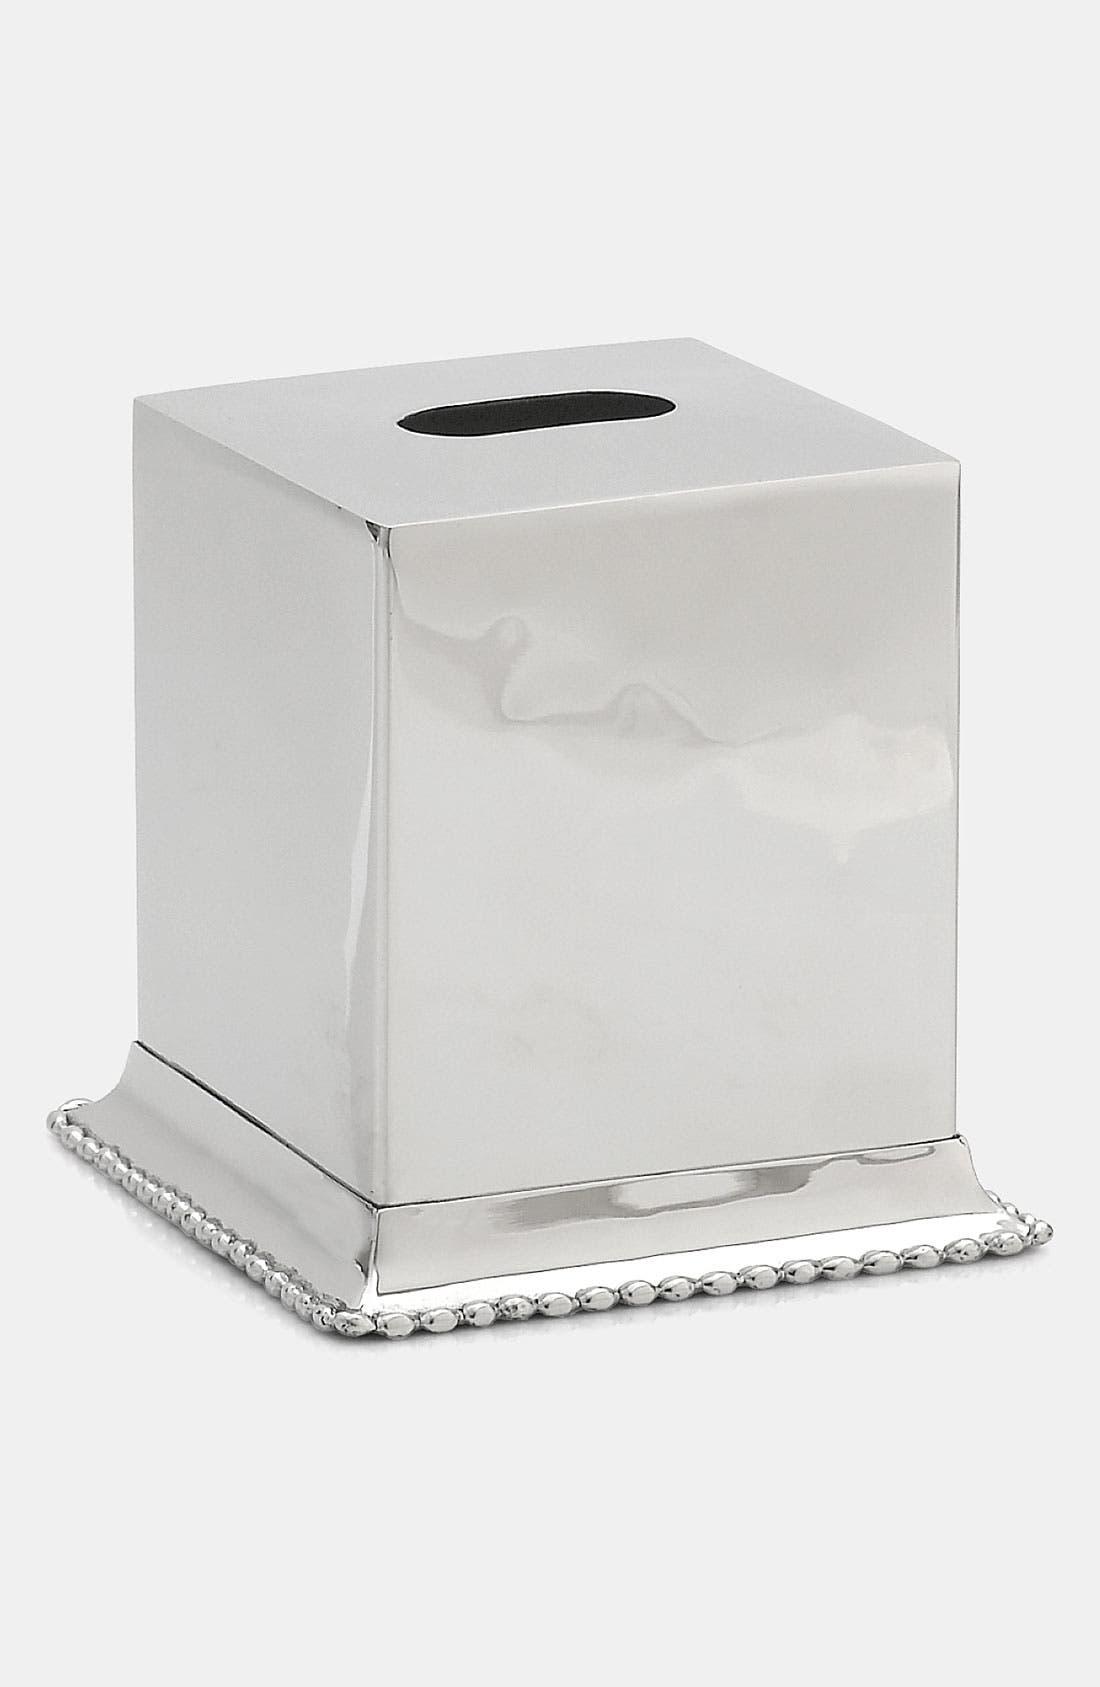 Main Image - Michael Aram 'New Molten' Tissue Box